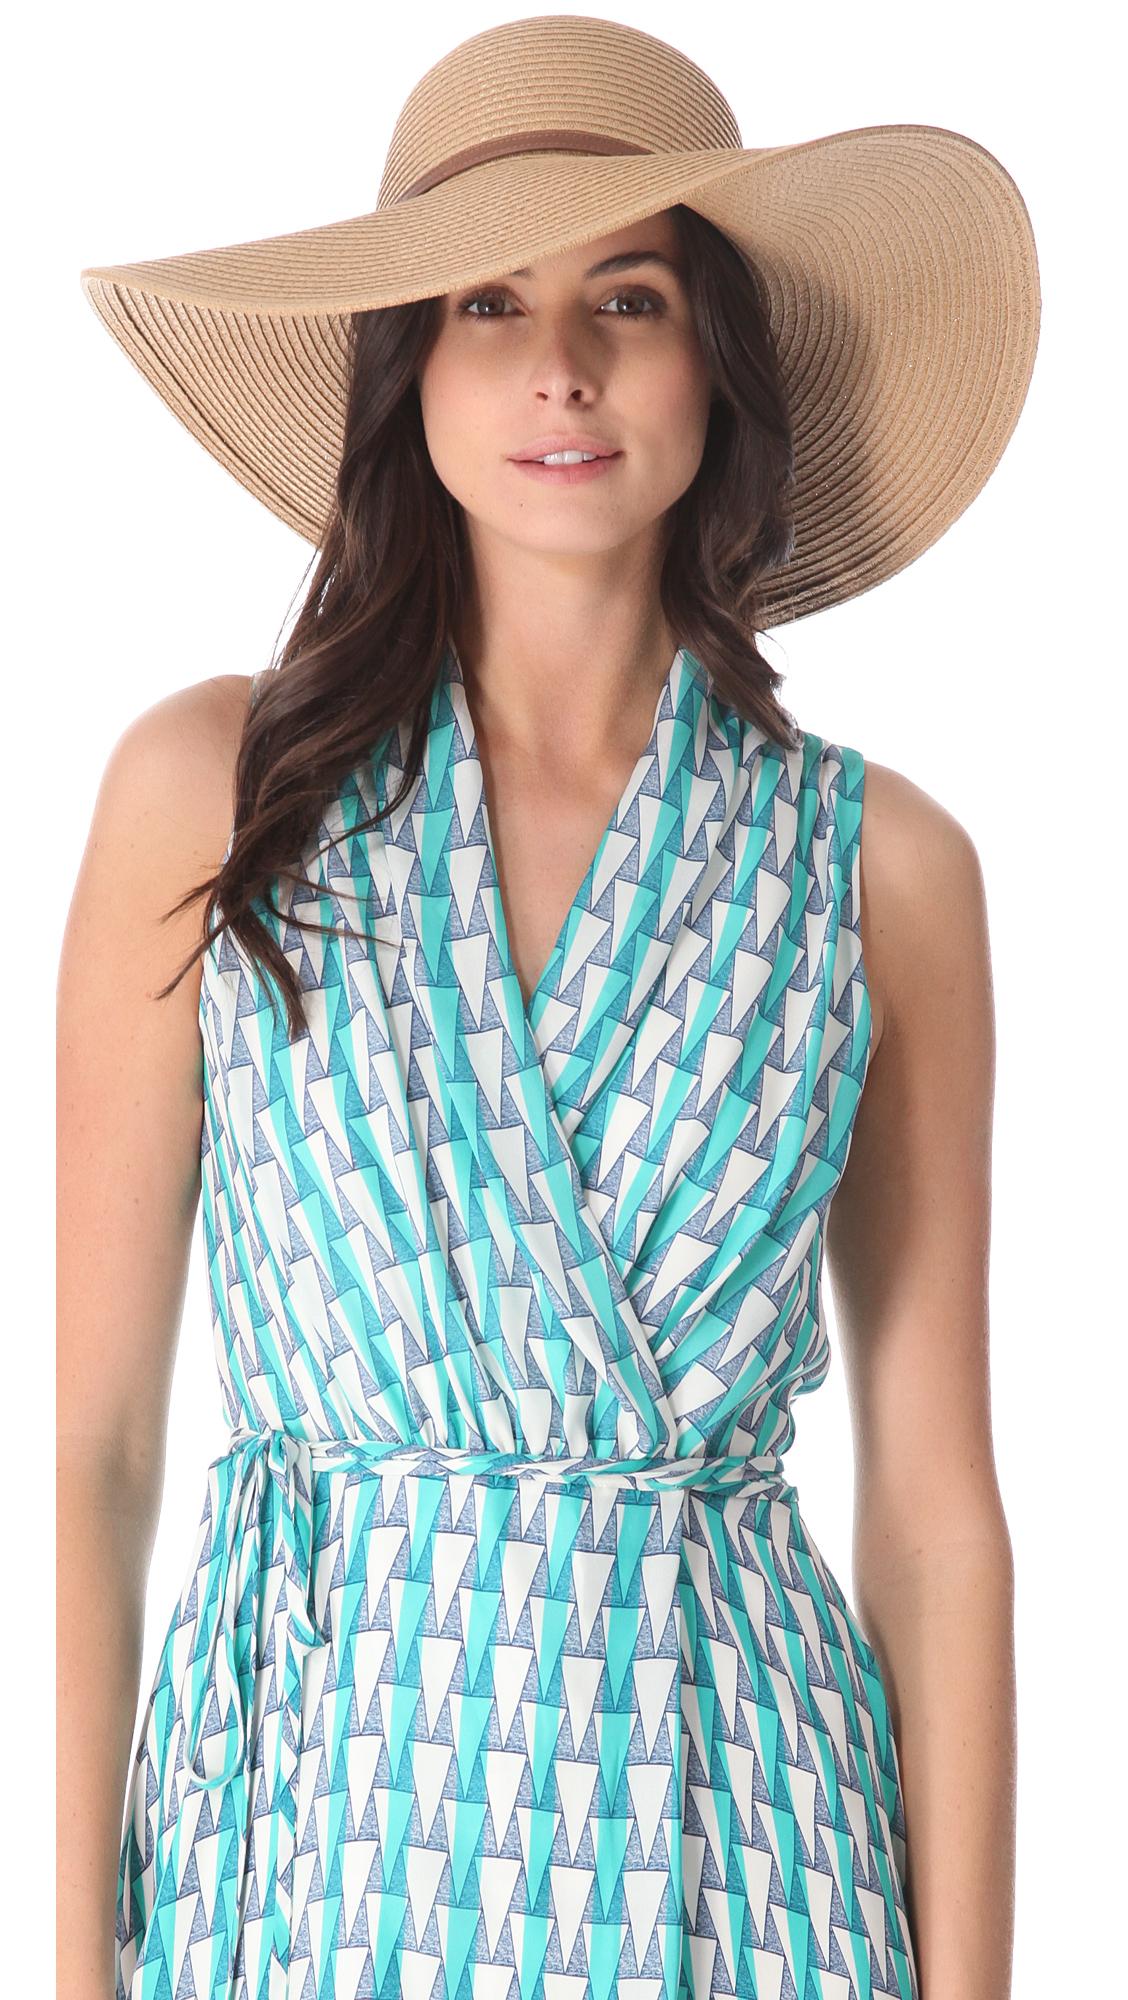 Lyst - Melissa Odabash Jemima Sun Hat in Brown 5adc84f6d093